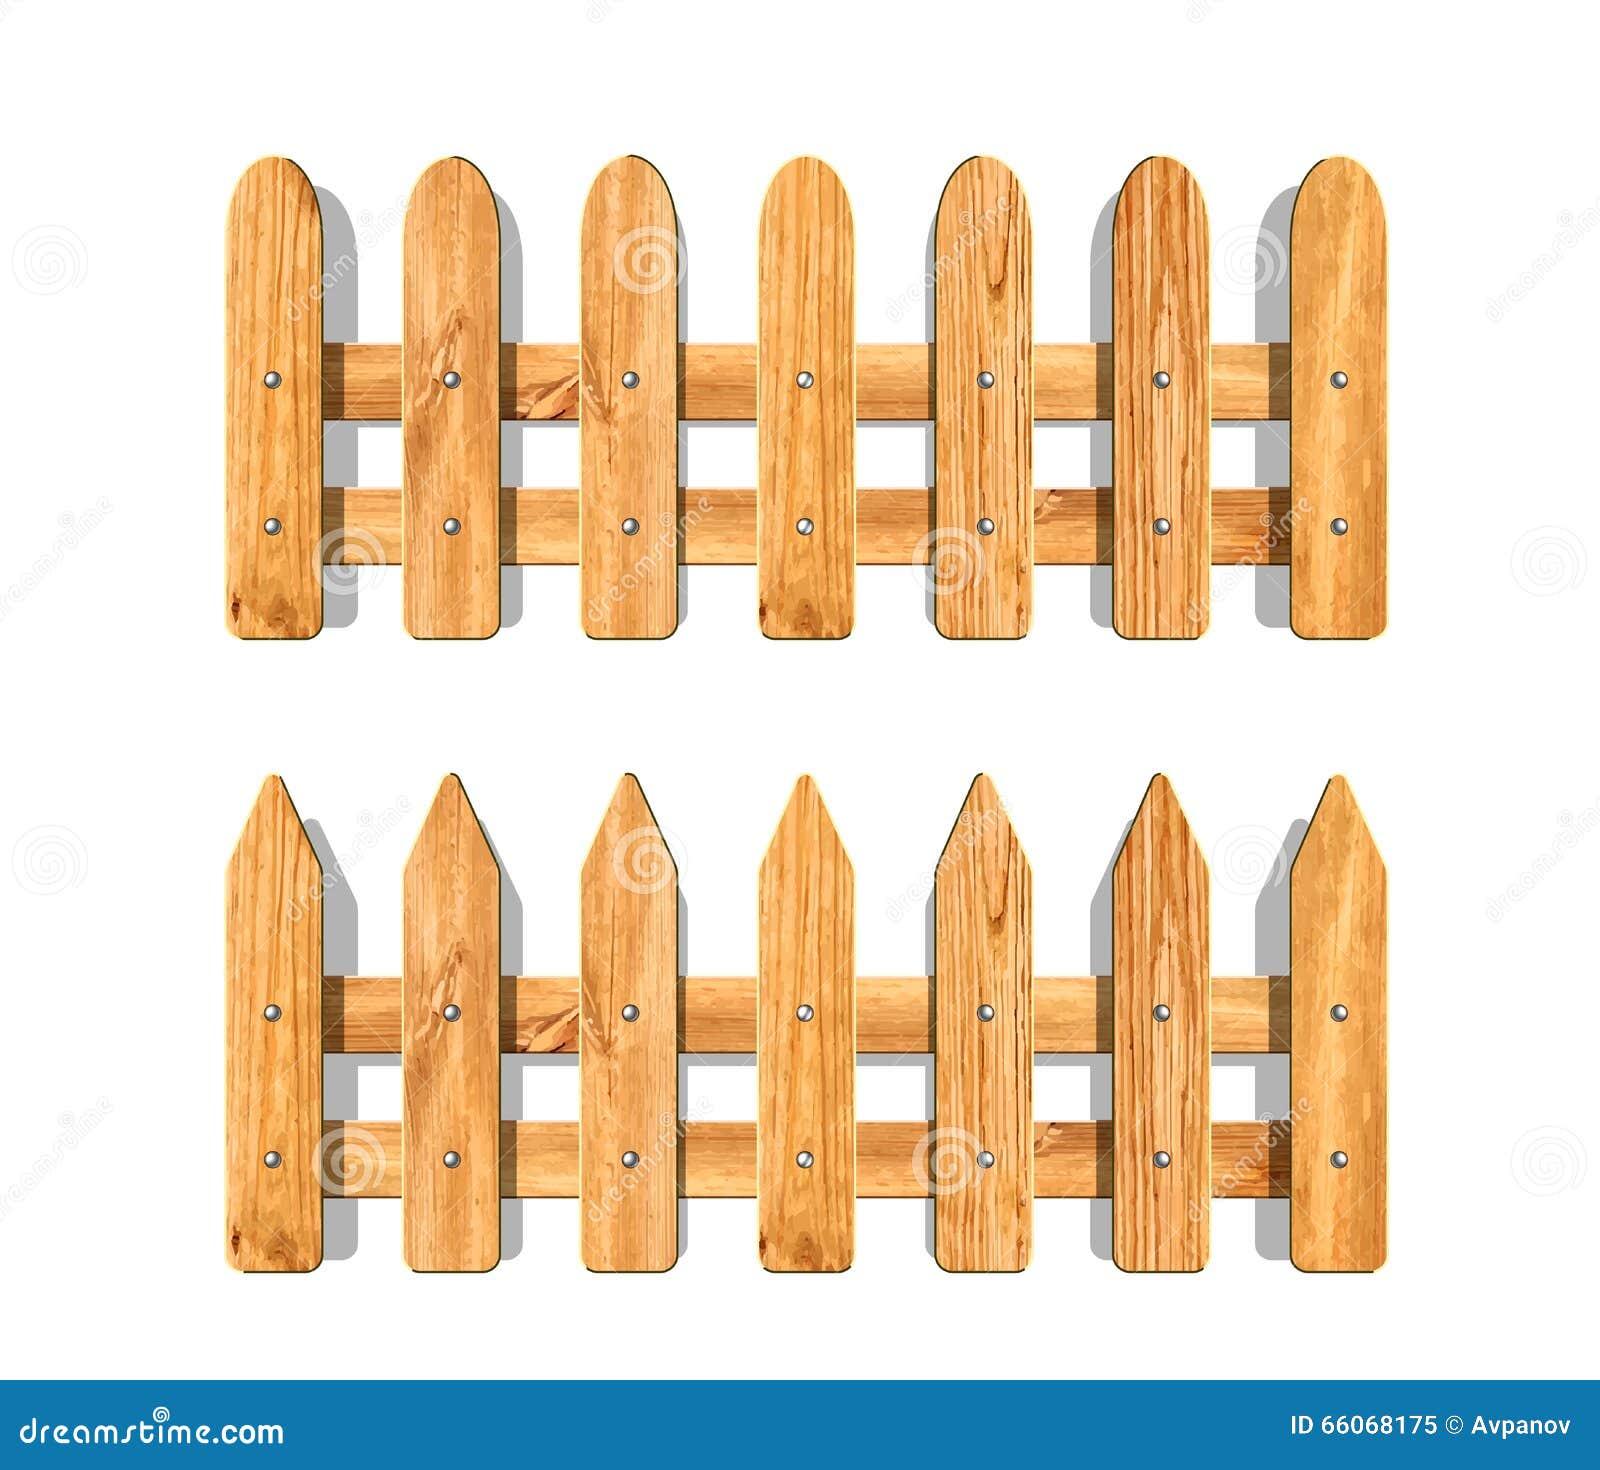 Mini fence front garden fencing decorative wooden classic for Barriere de jardin